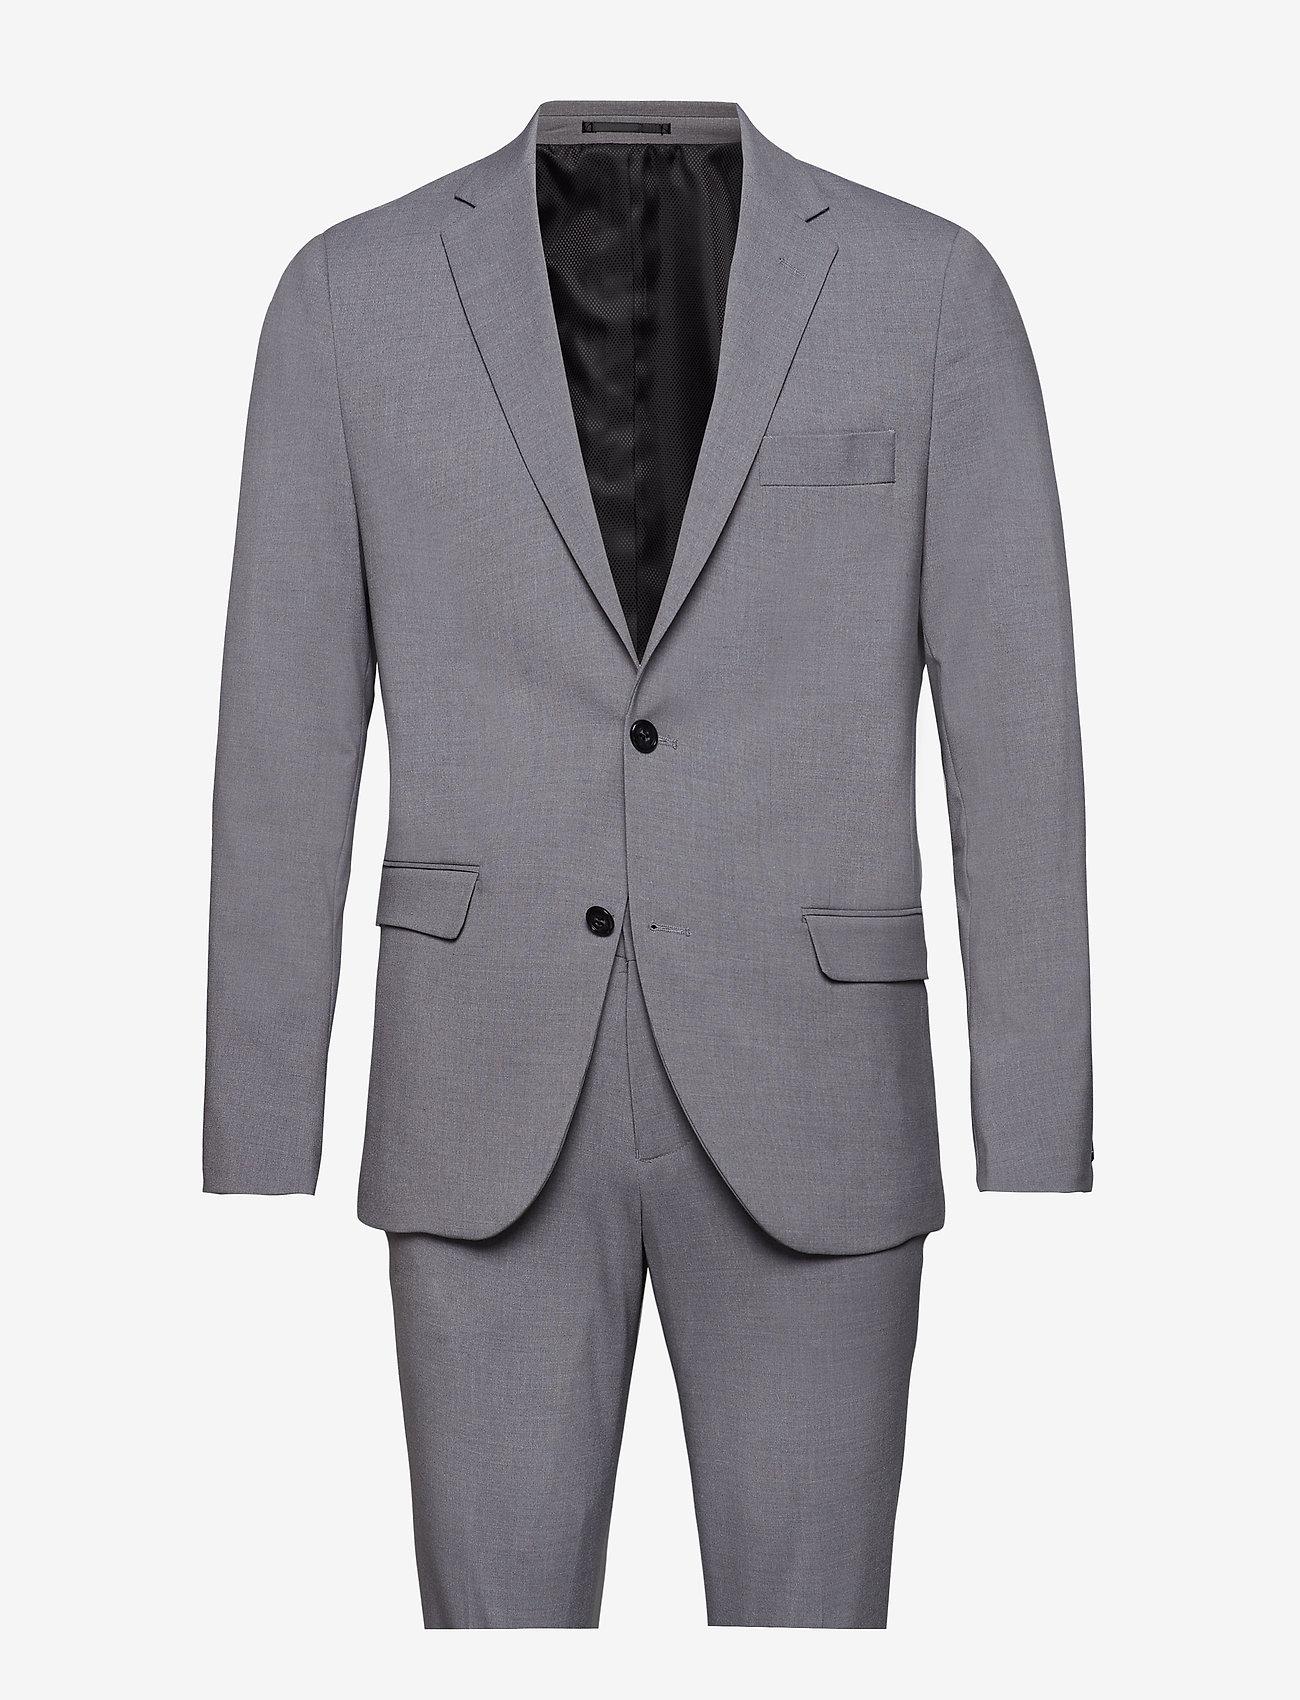 Lindbergh - Plain mens suit - yksiriviset puvut - lt grey - 0